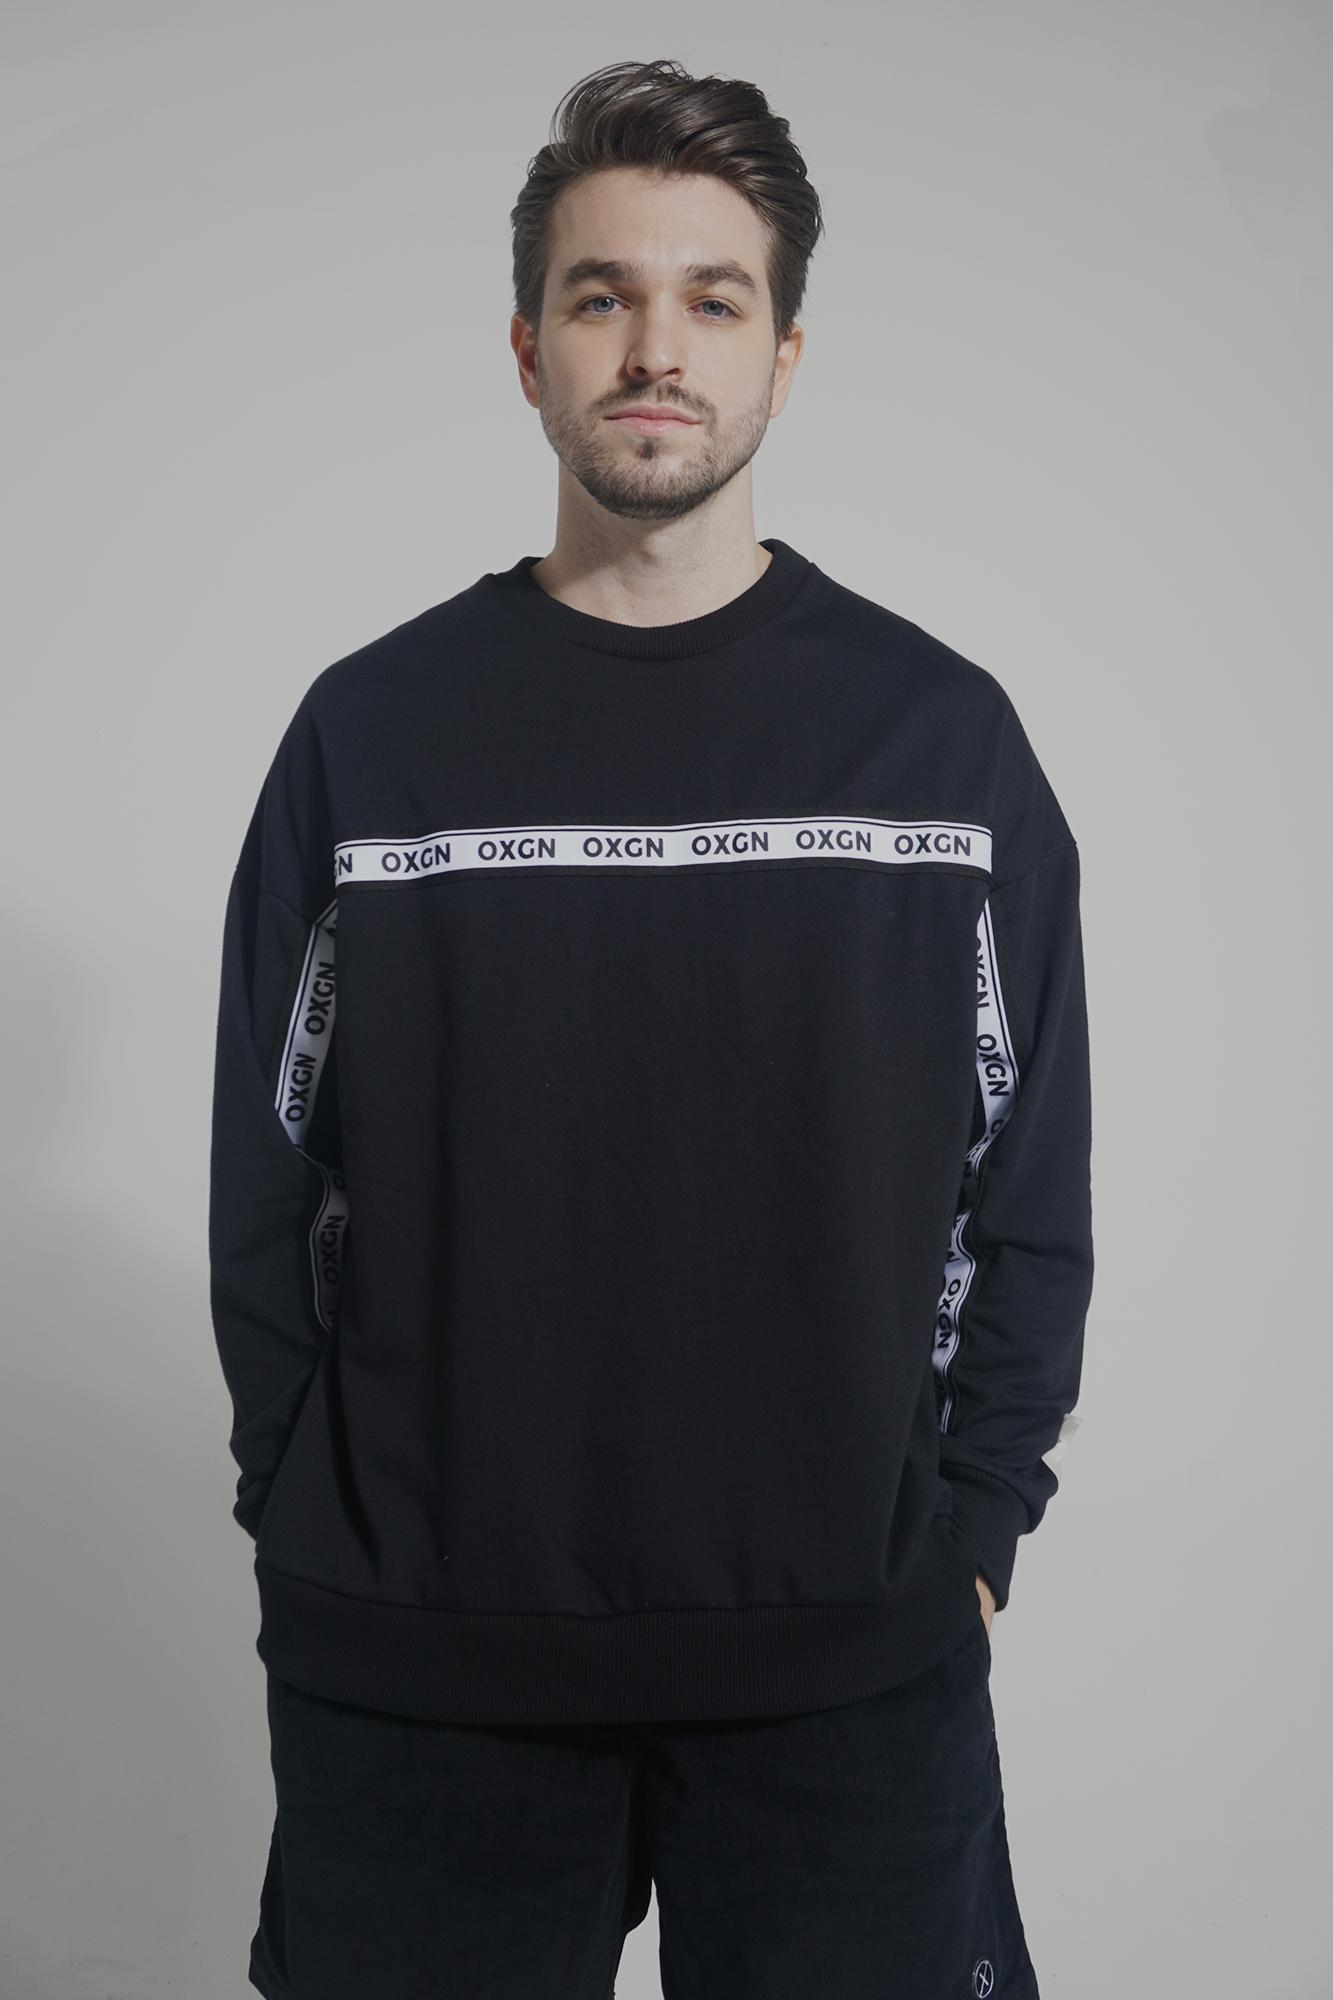 OXGN Women's Premium Threads Pullover With Contrast Trim (Black)